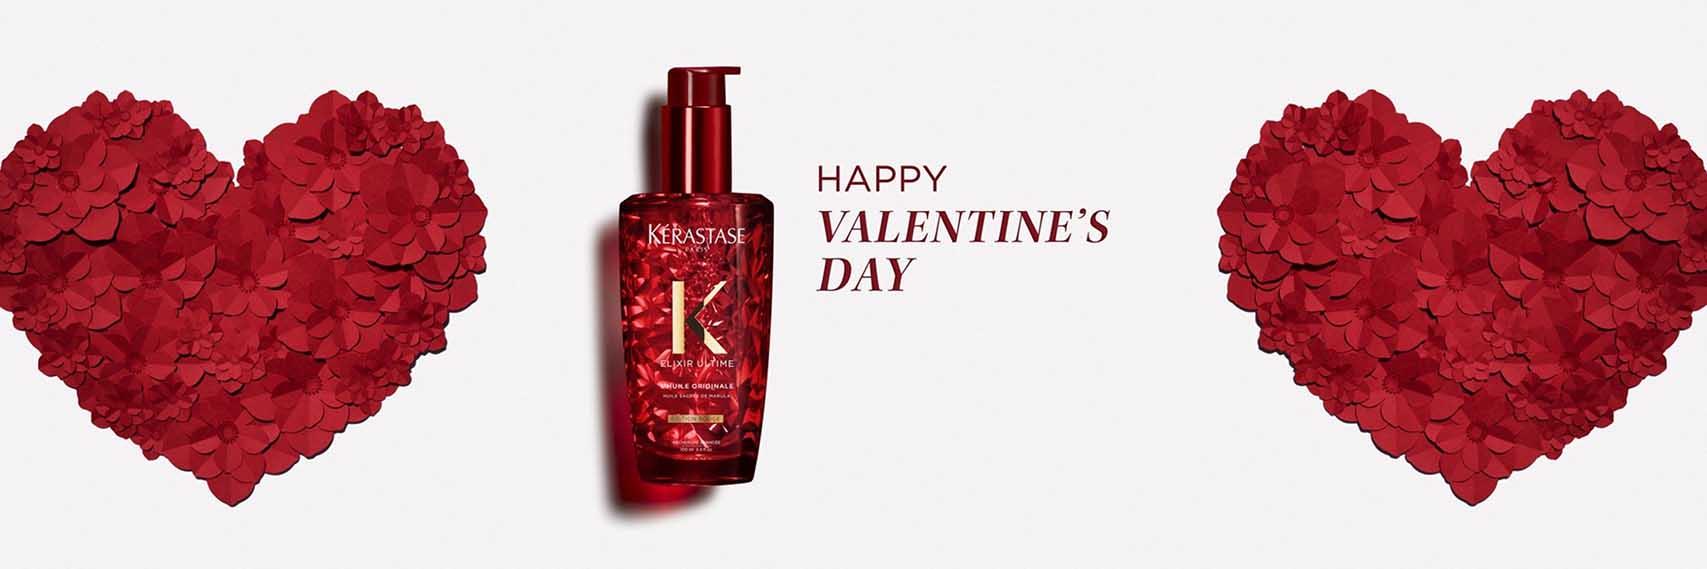 Valentine's Day 2020, קרסטס שמן לשיער אלקסיר אולטים באדום-1